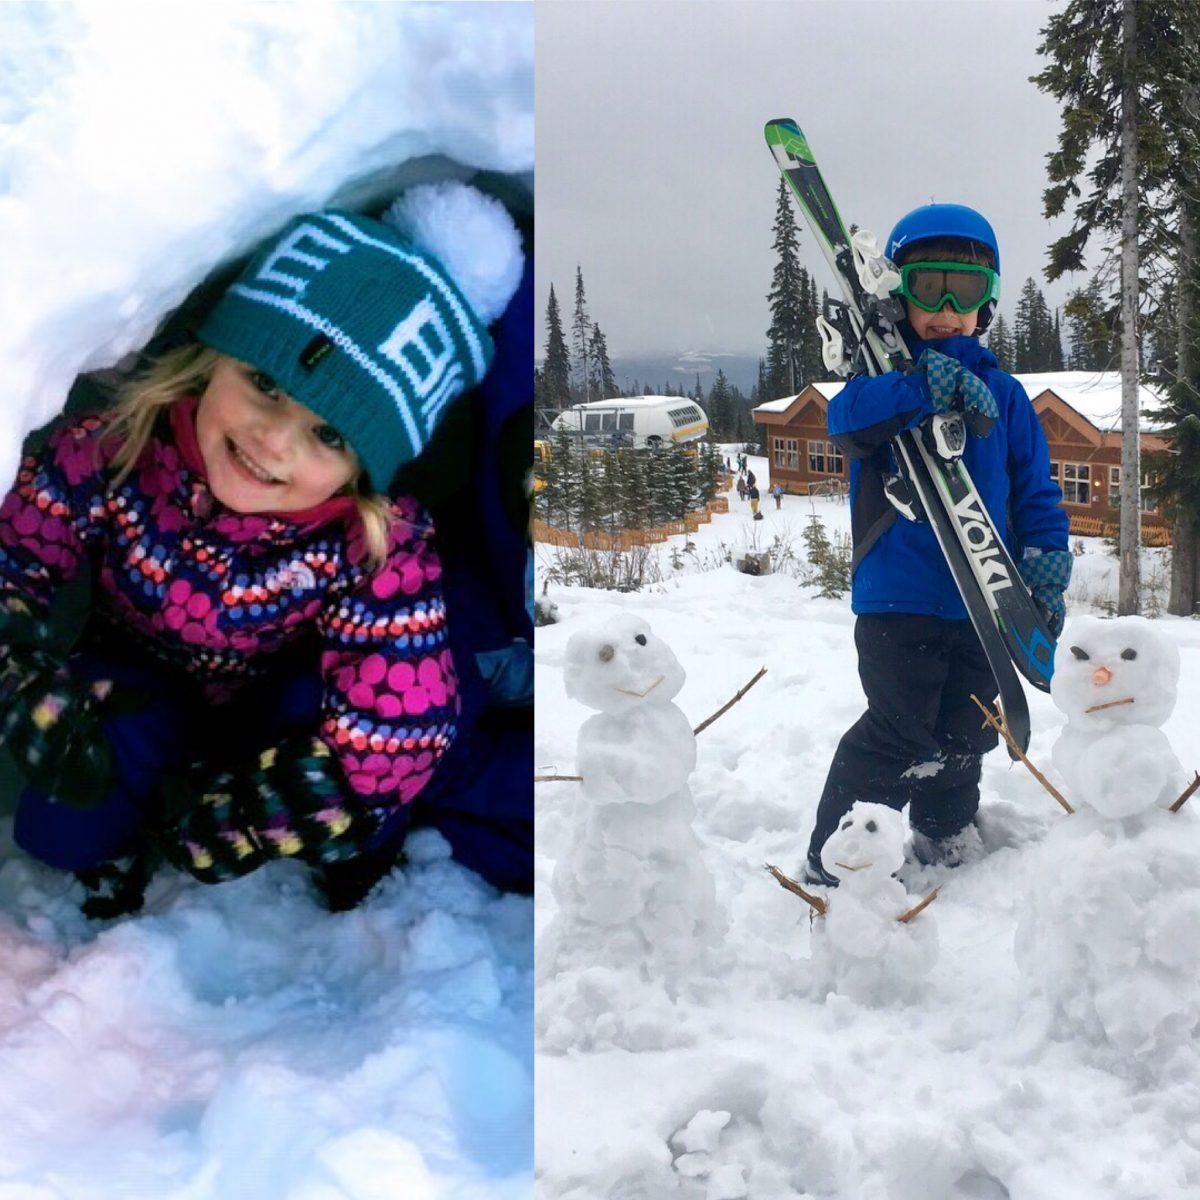 snow activities canada